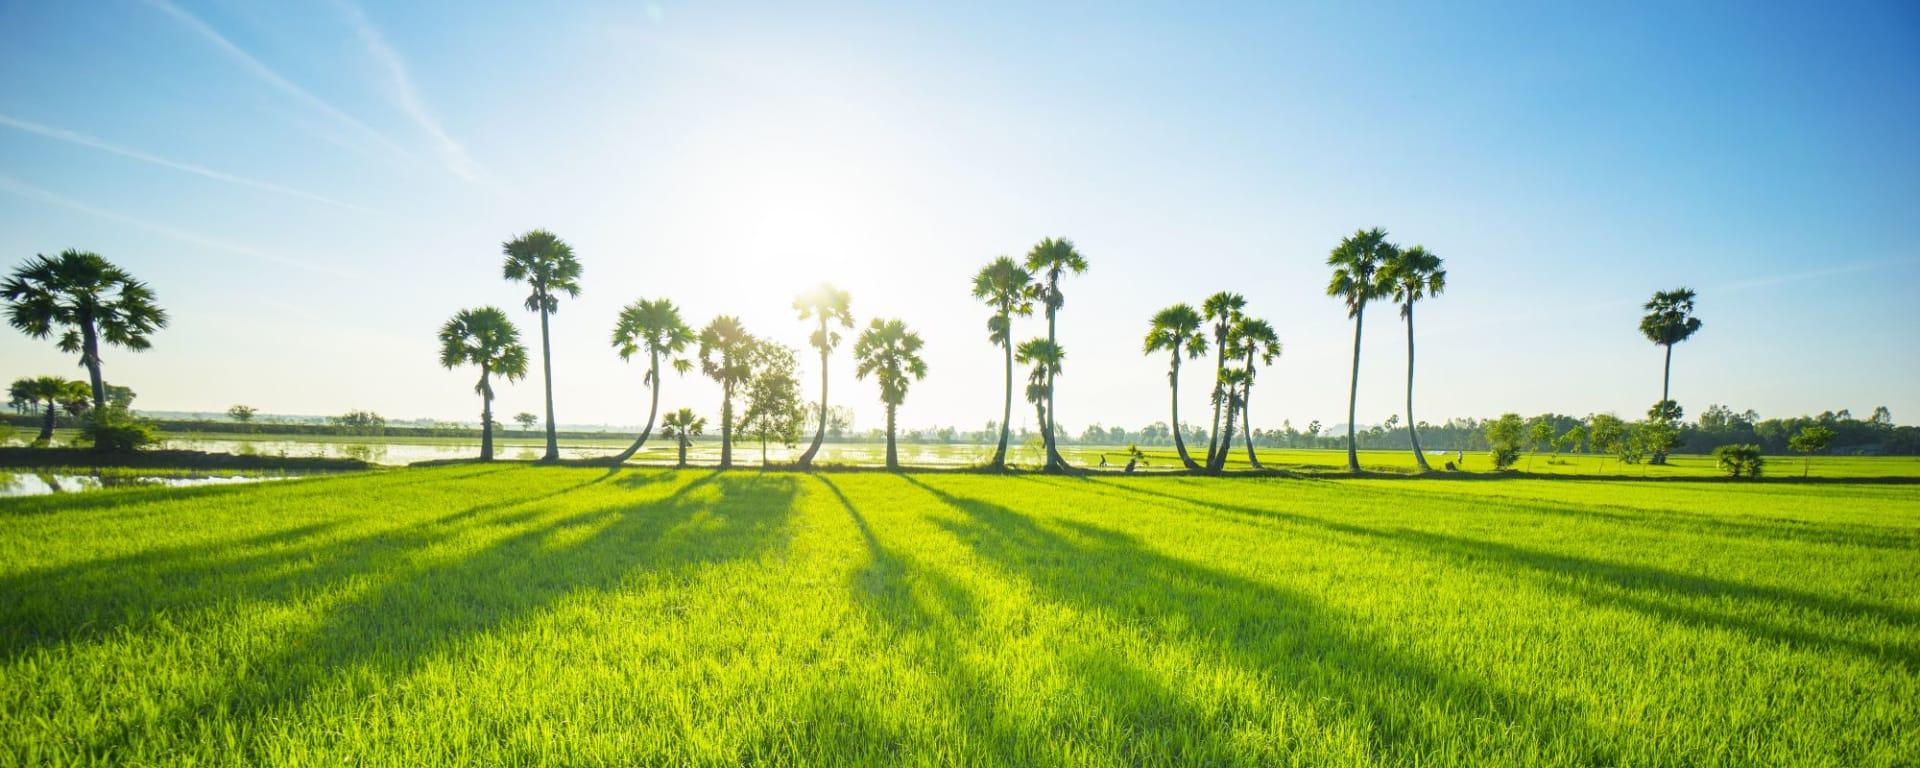 Le delta du Mékong - de/à Saigon: Mekong Delta: beautiful countryside